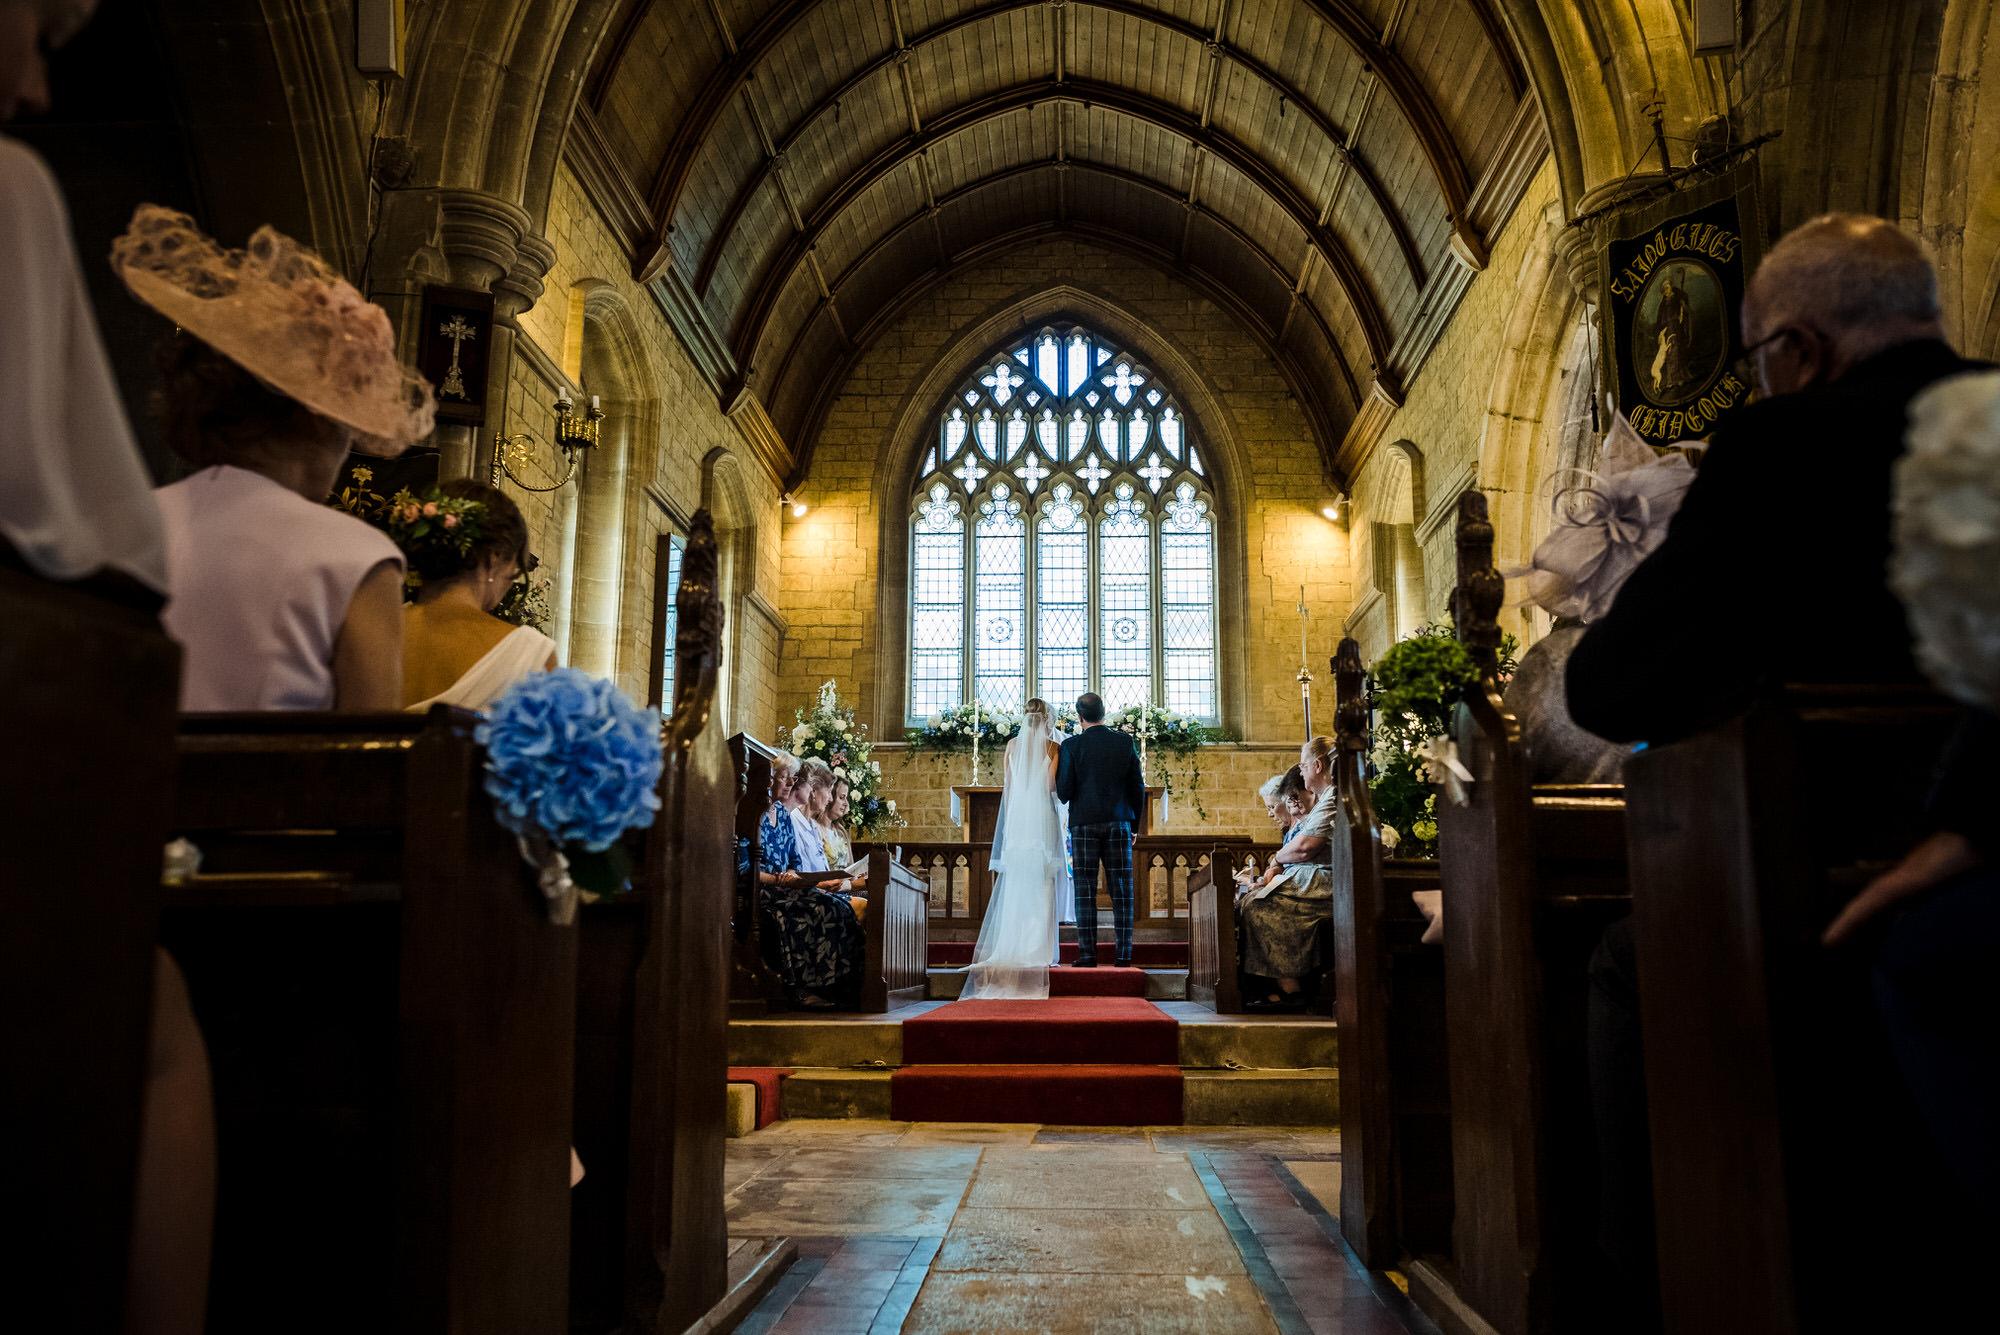 Dorset marquee wedding by the sea simon biffen photography 18